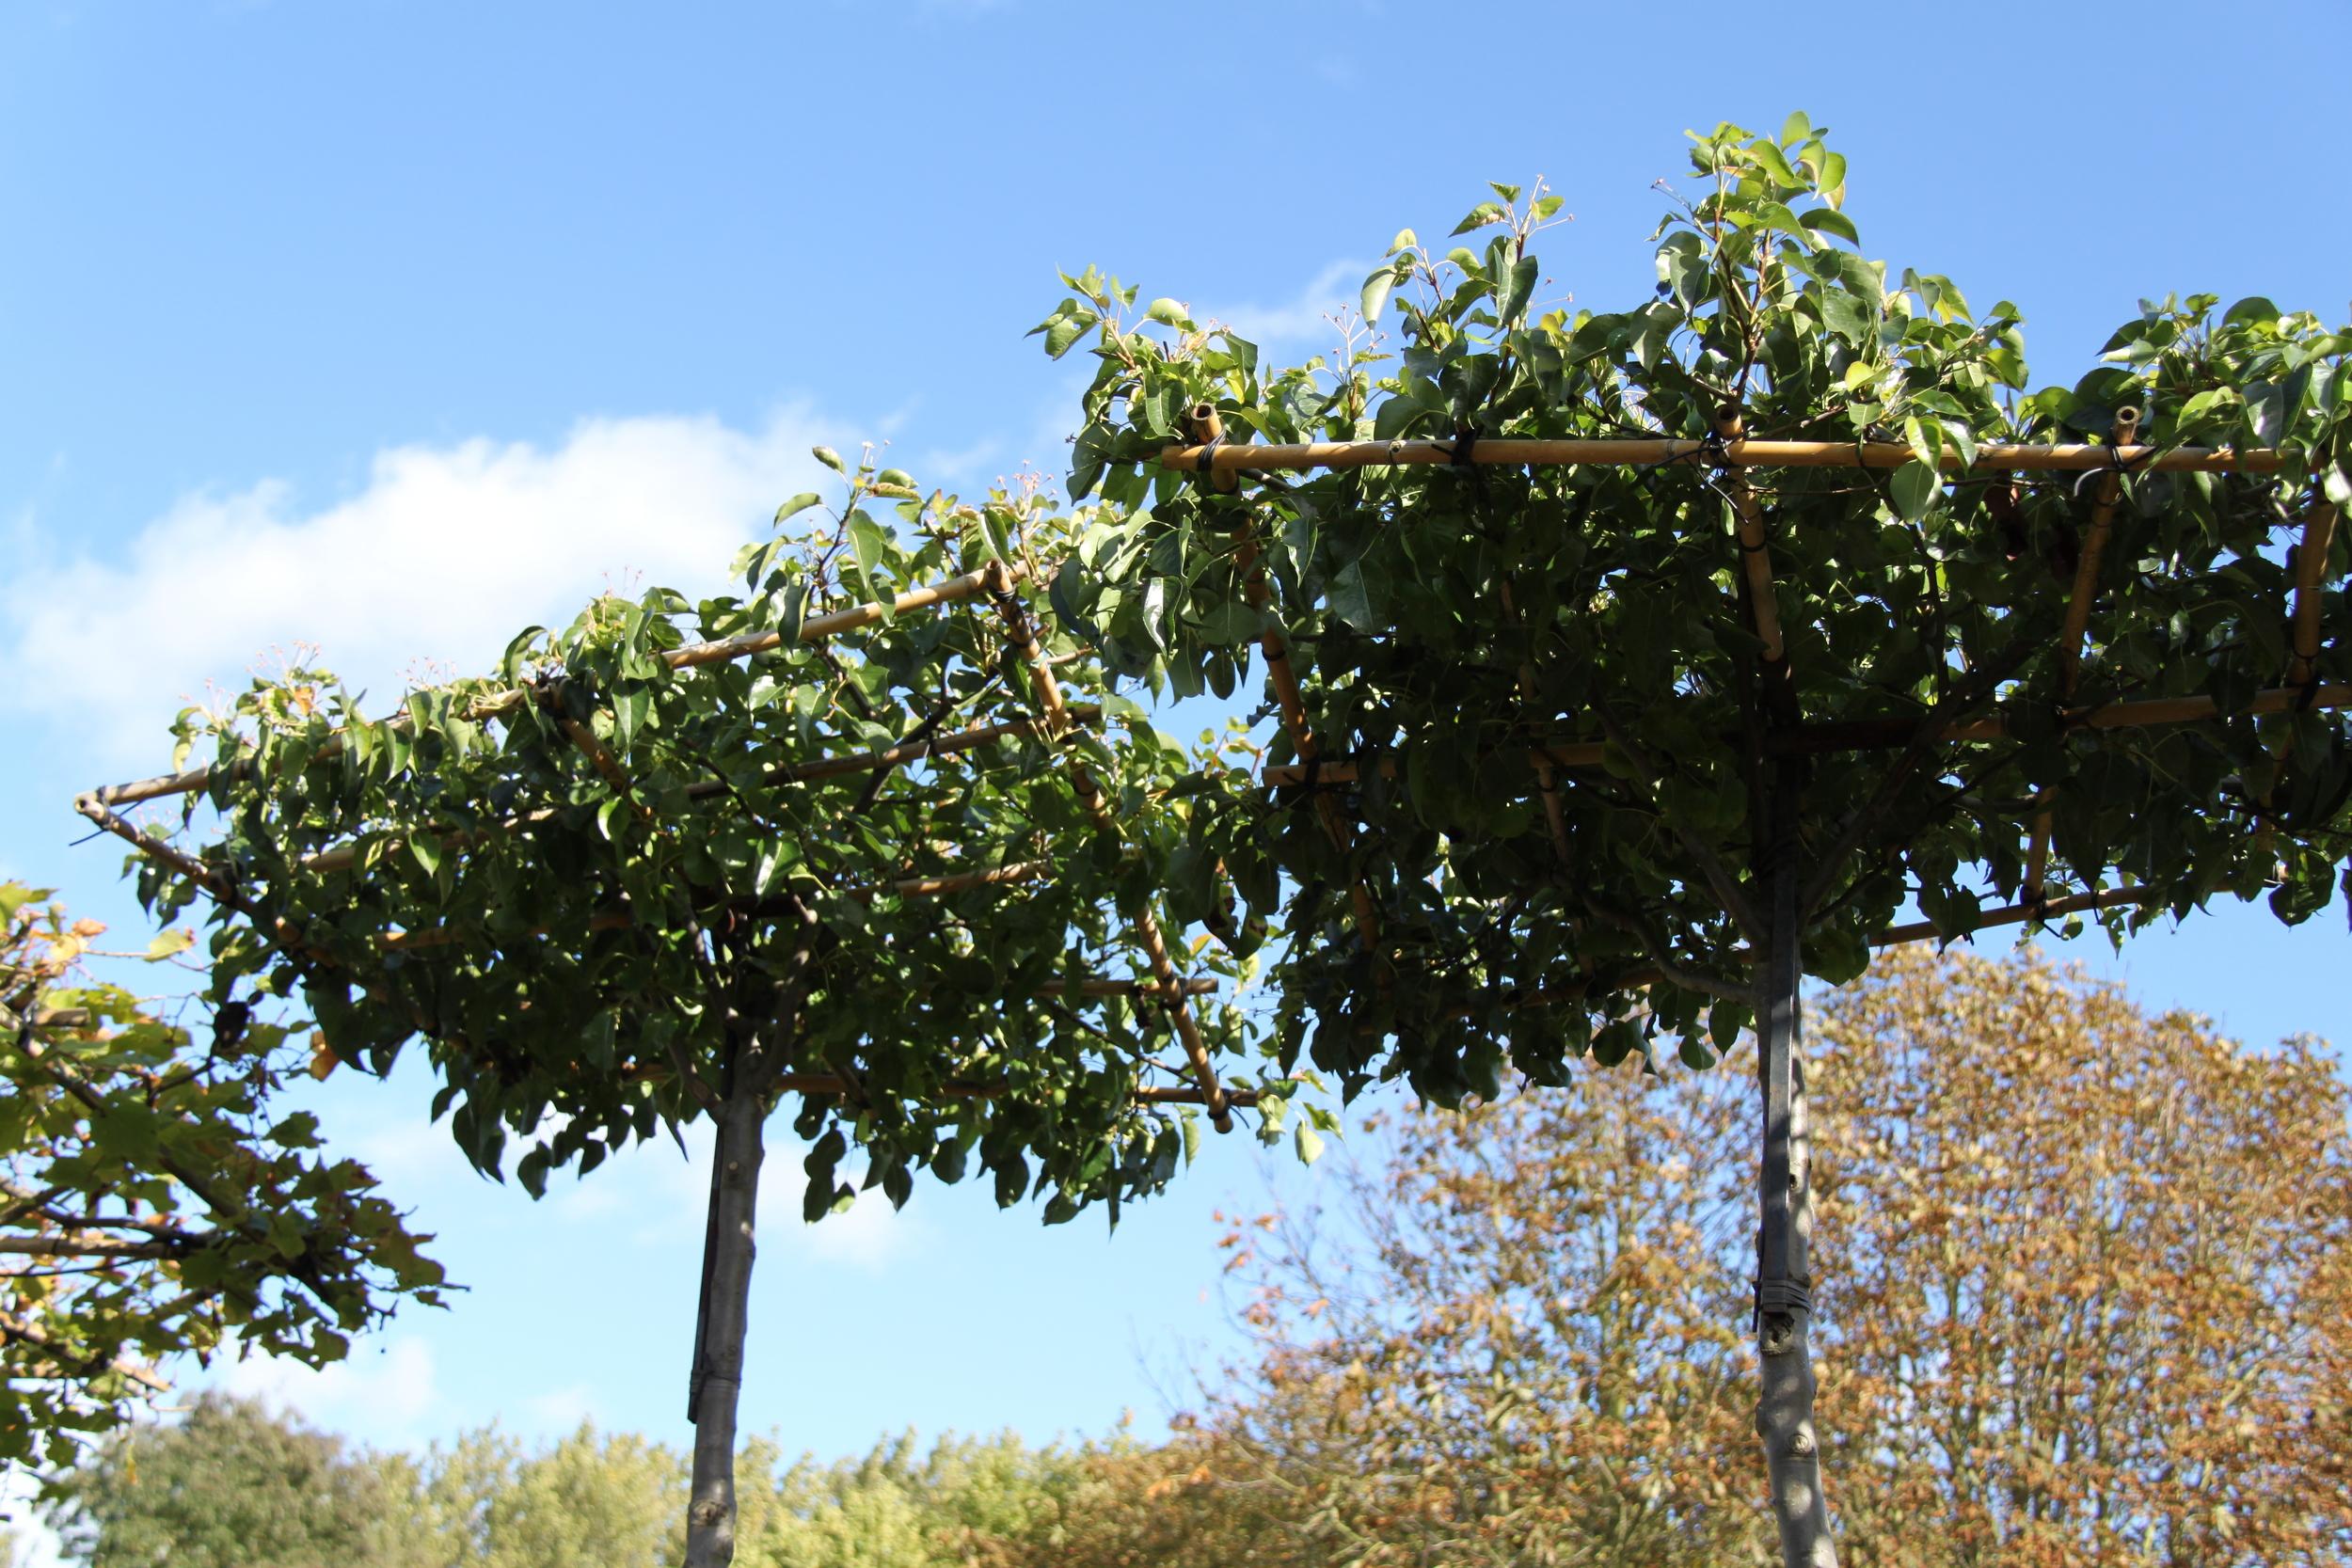 Parasol trees